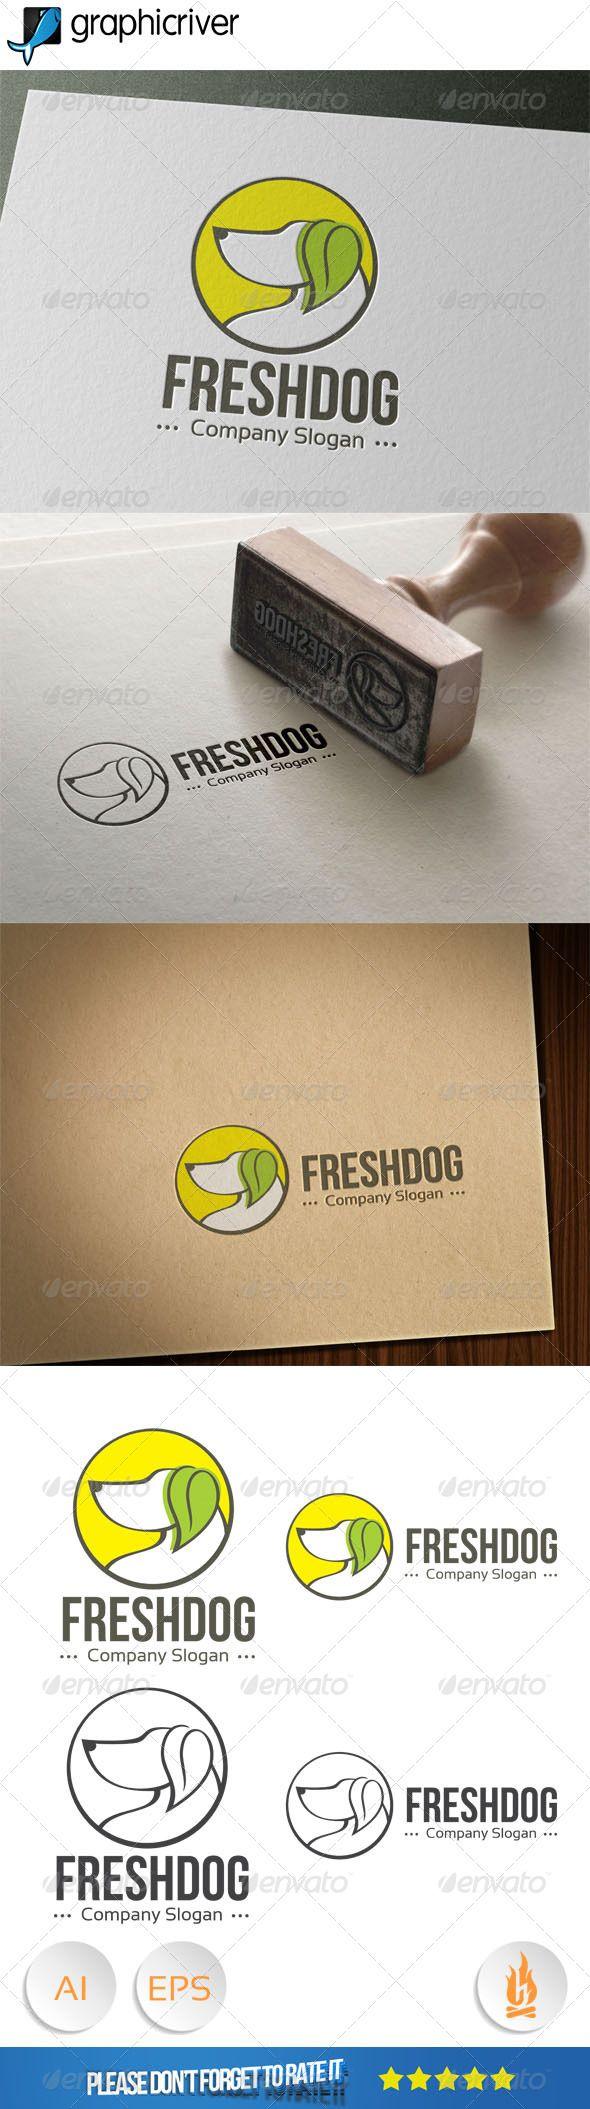 best dog bed images on pinterest doggies dog stuff and dog